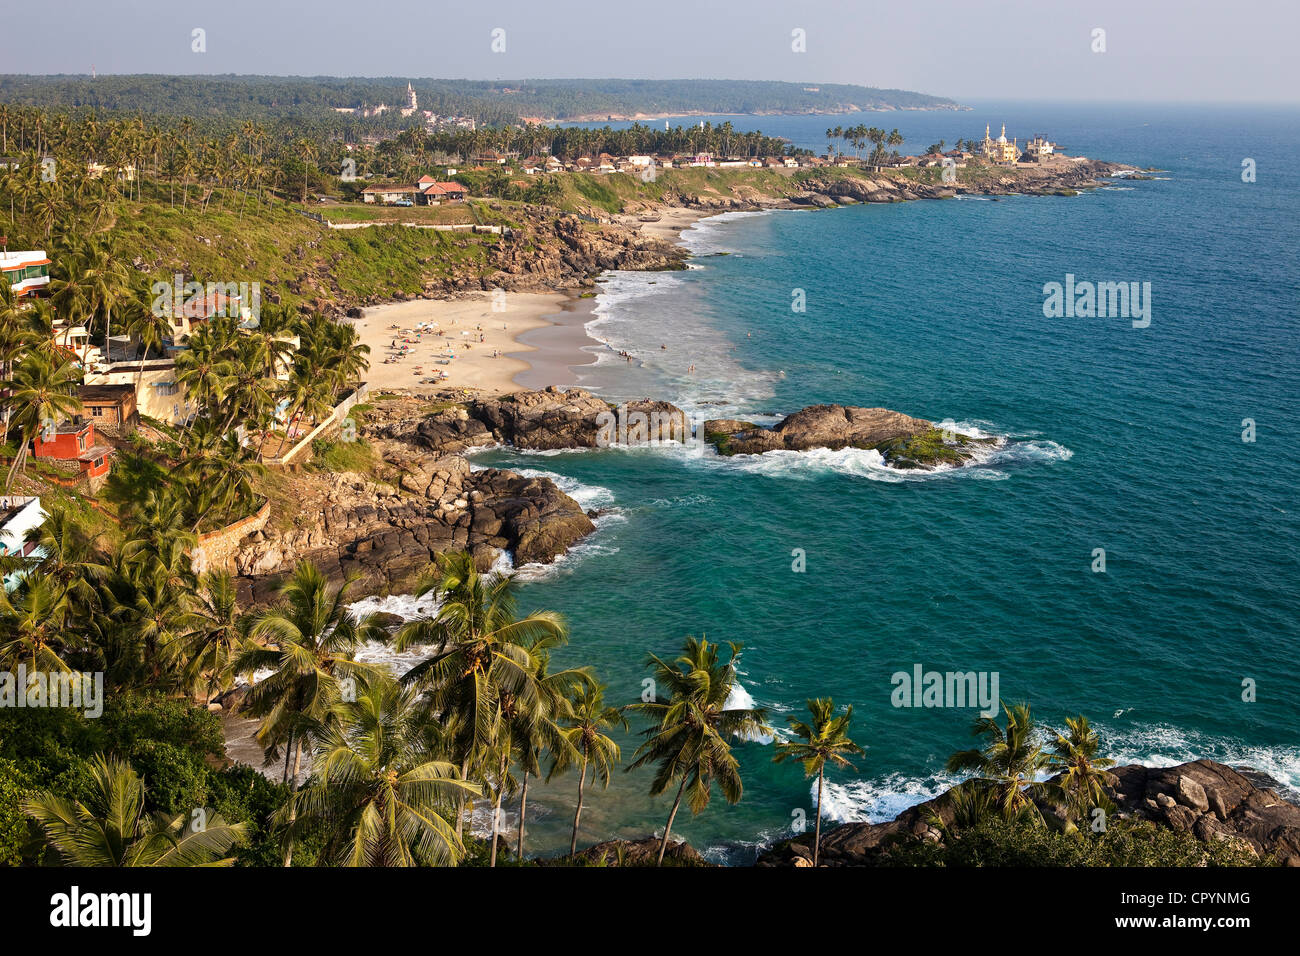 India, Kerala State, seaside resort of Kovalam (aerial view) - Stock Image